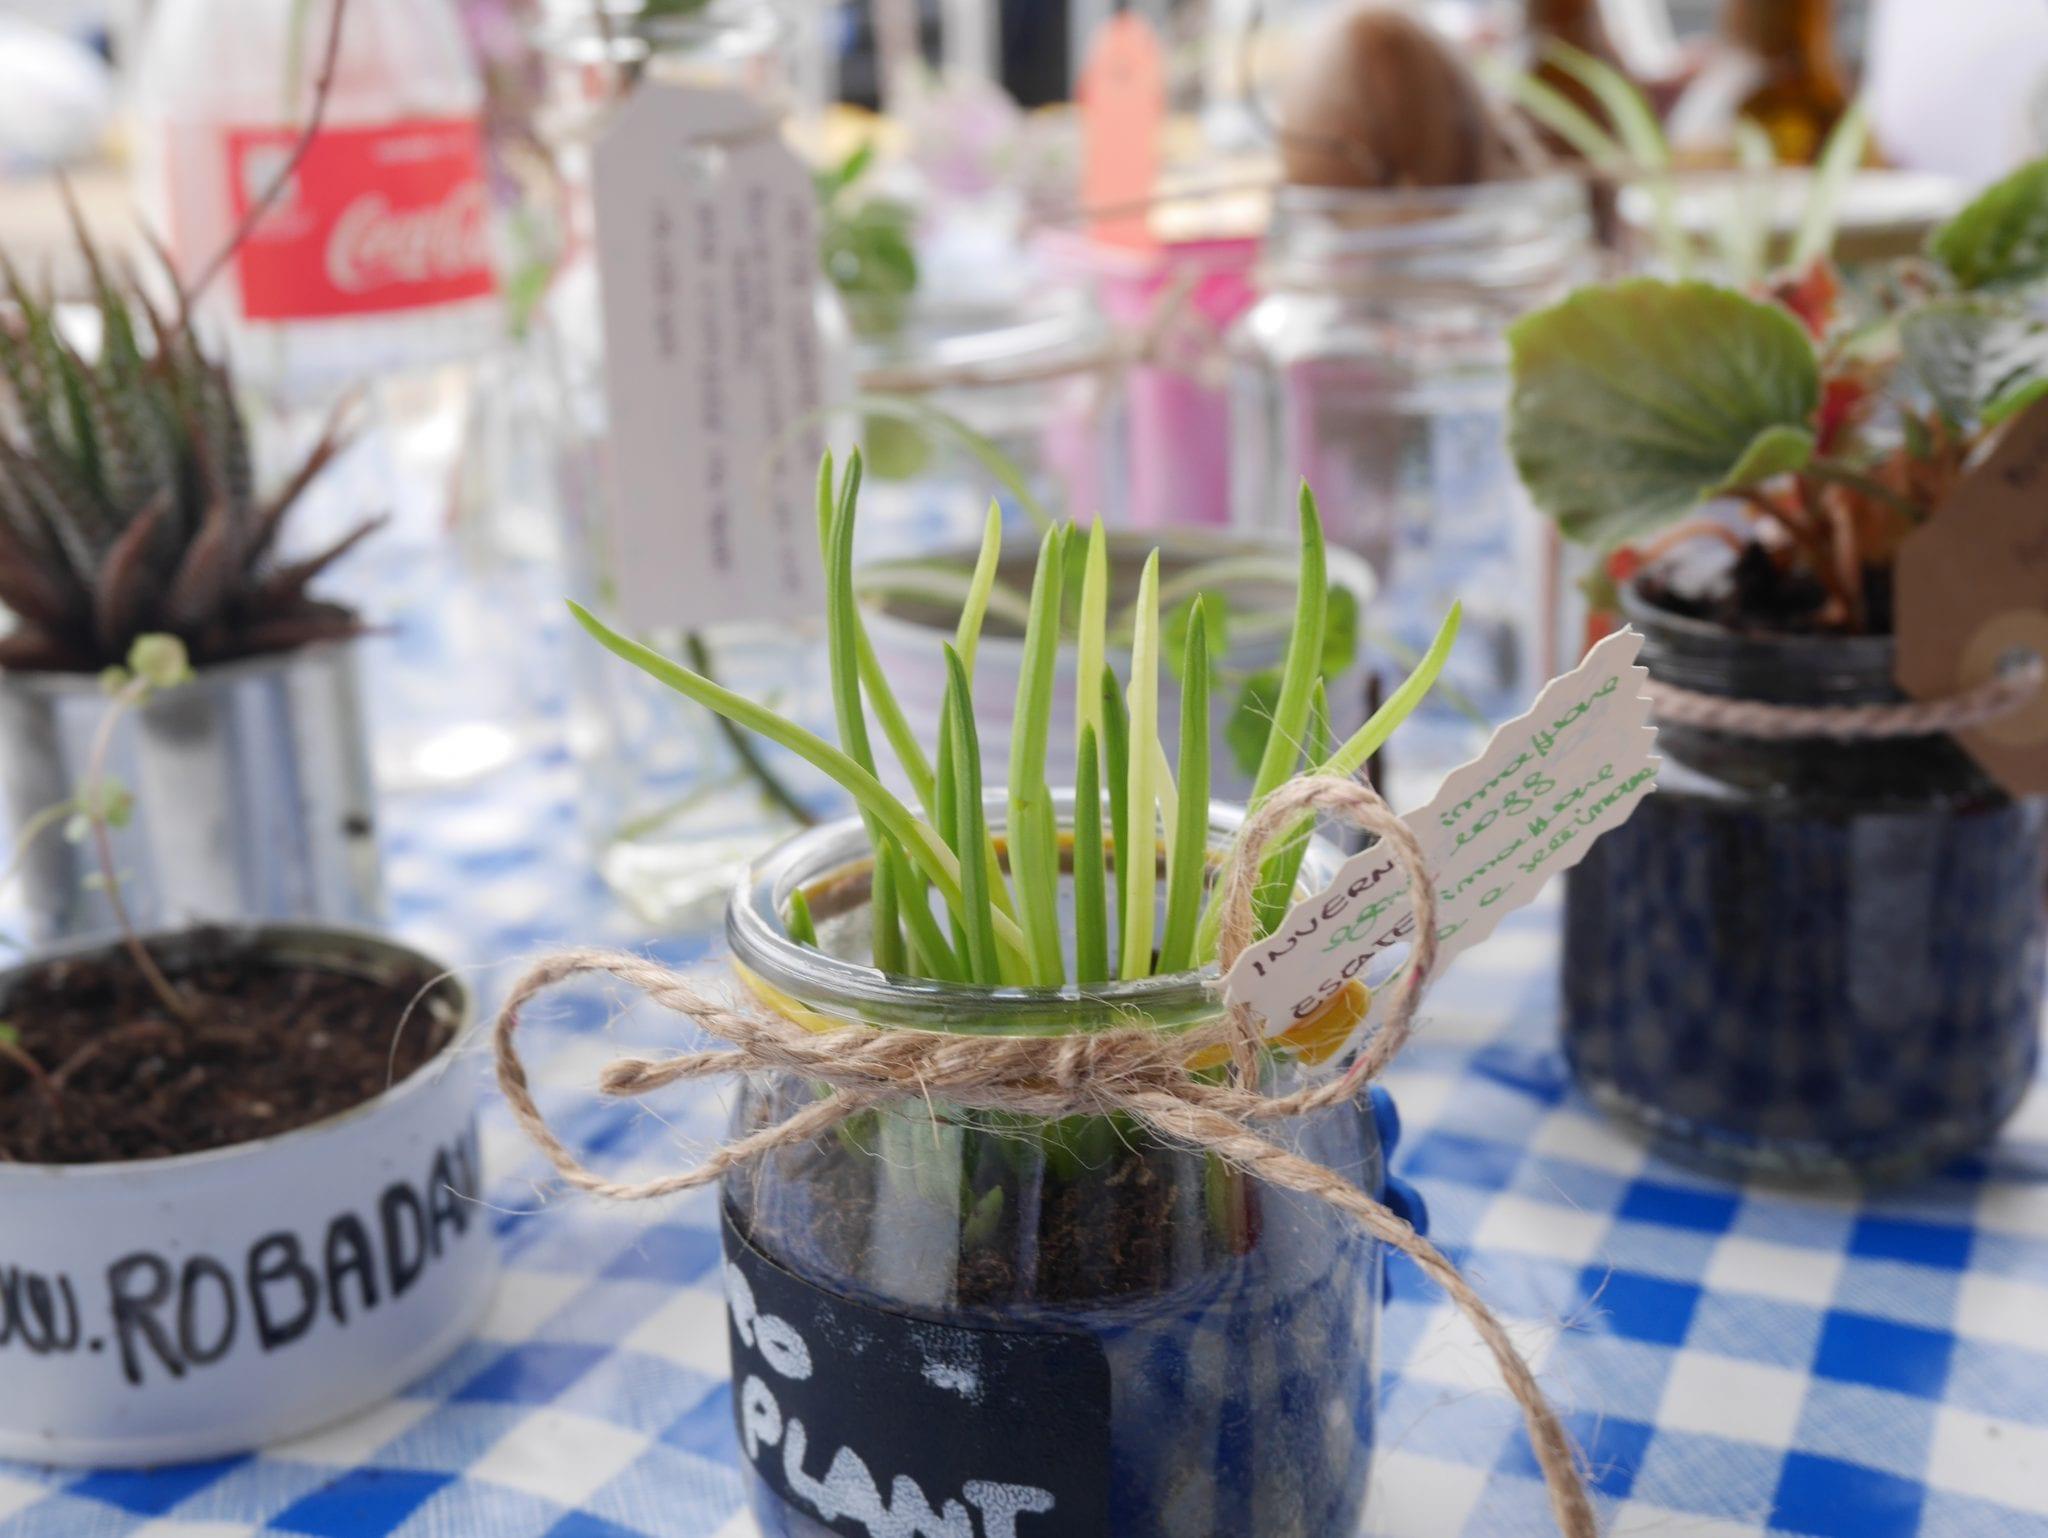 Senecio plant swap on board - Le Plume